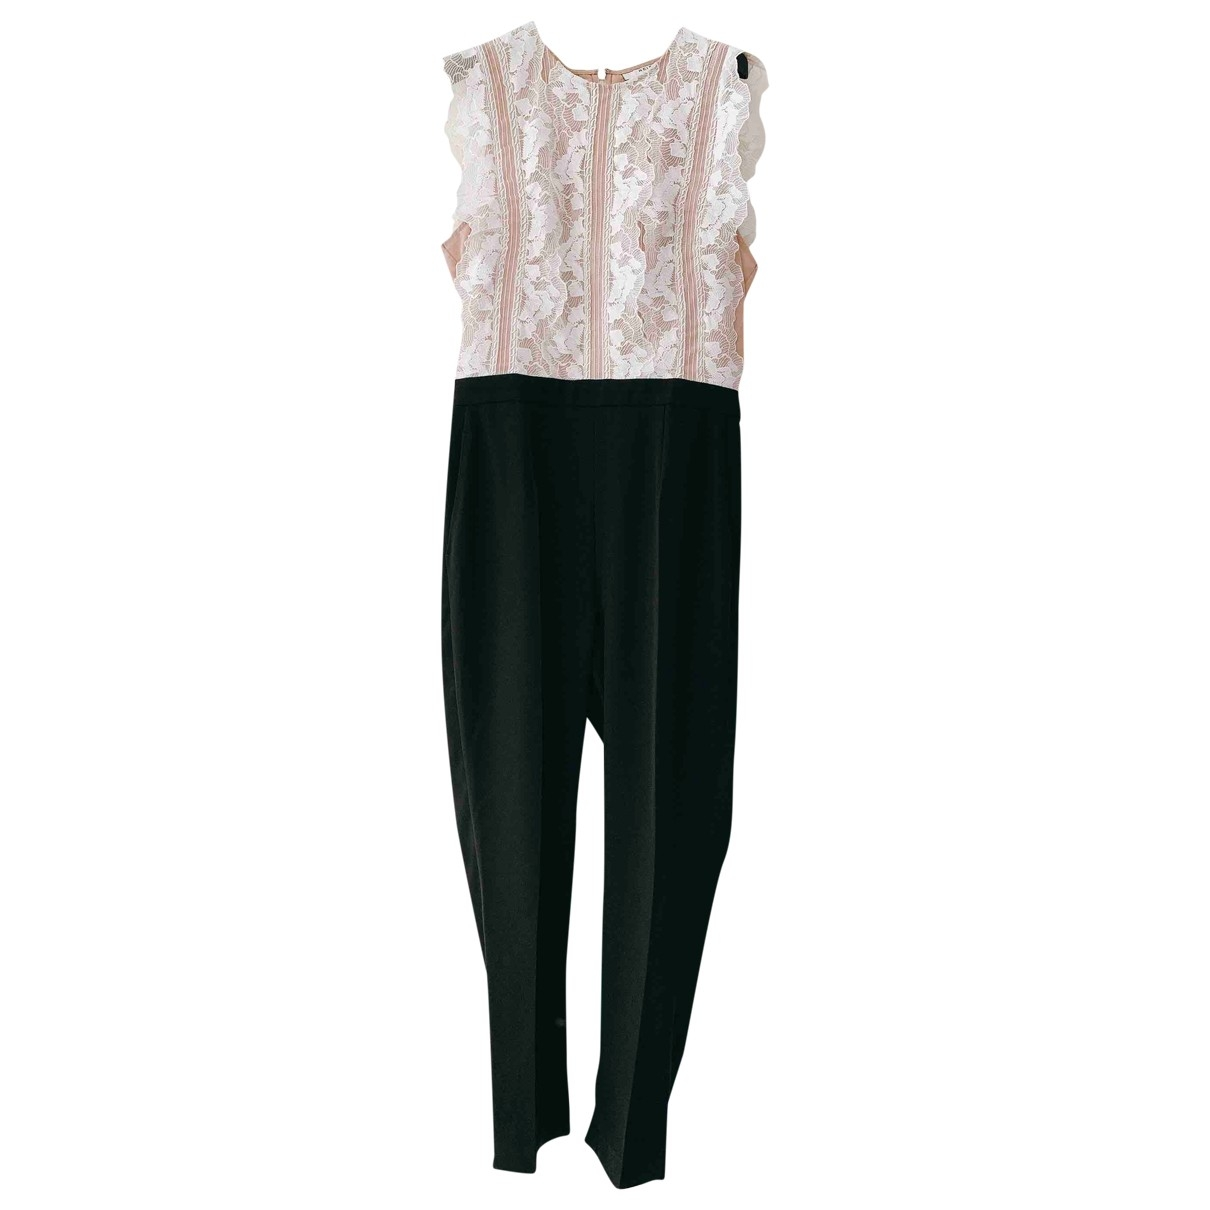 Reiss \N Multicolour jumpsuit for Women 12 UK